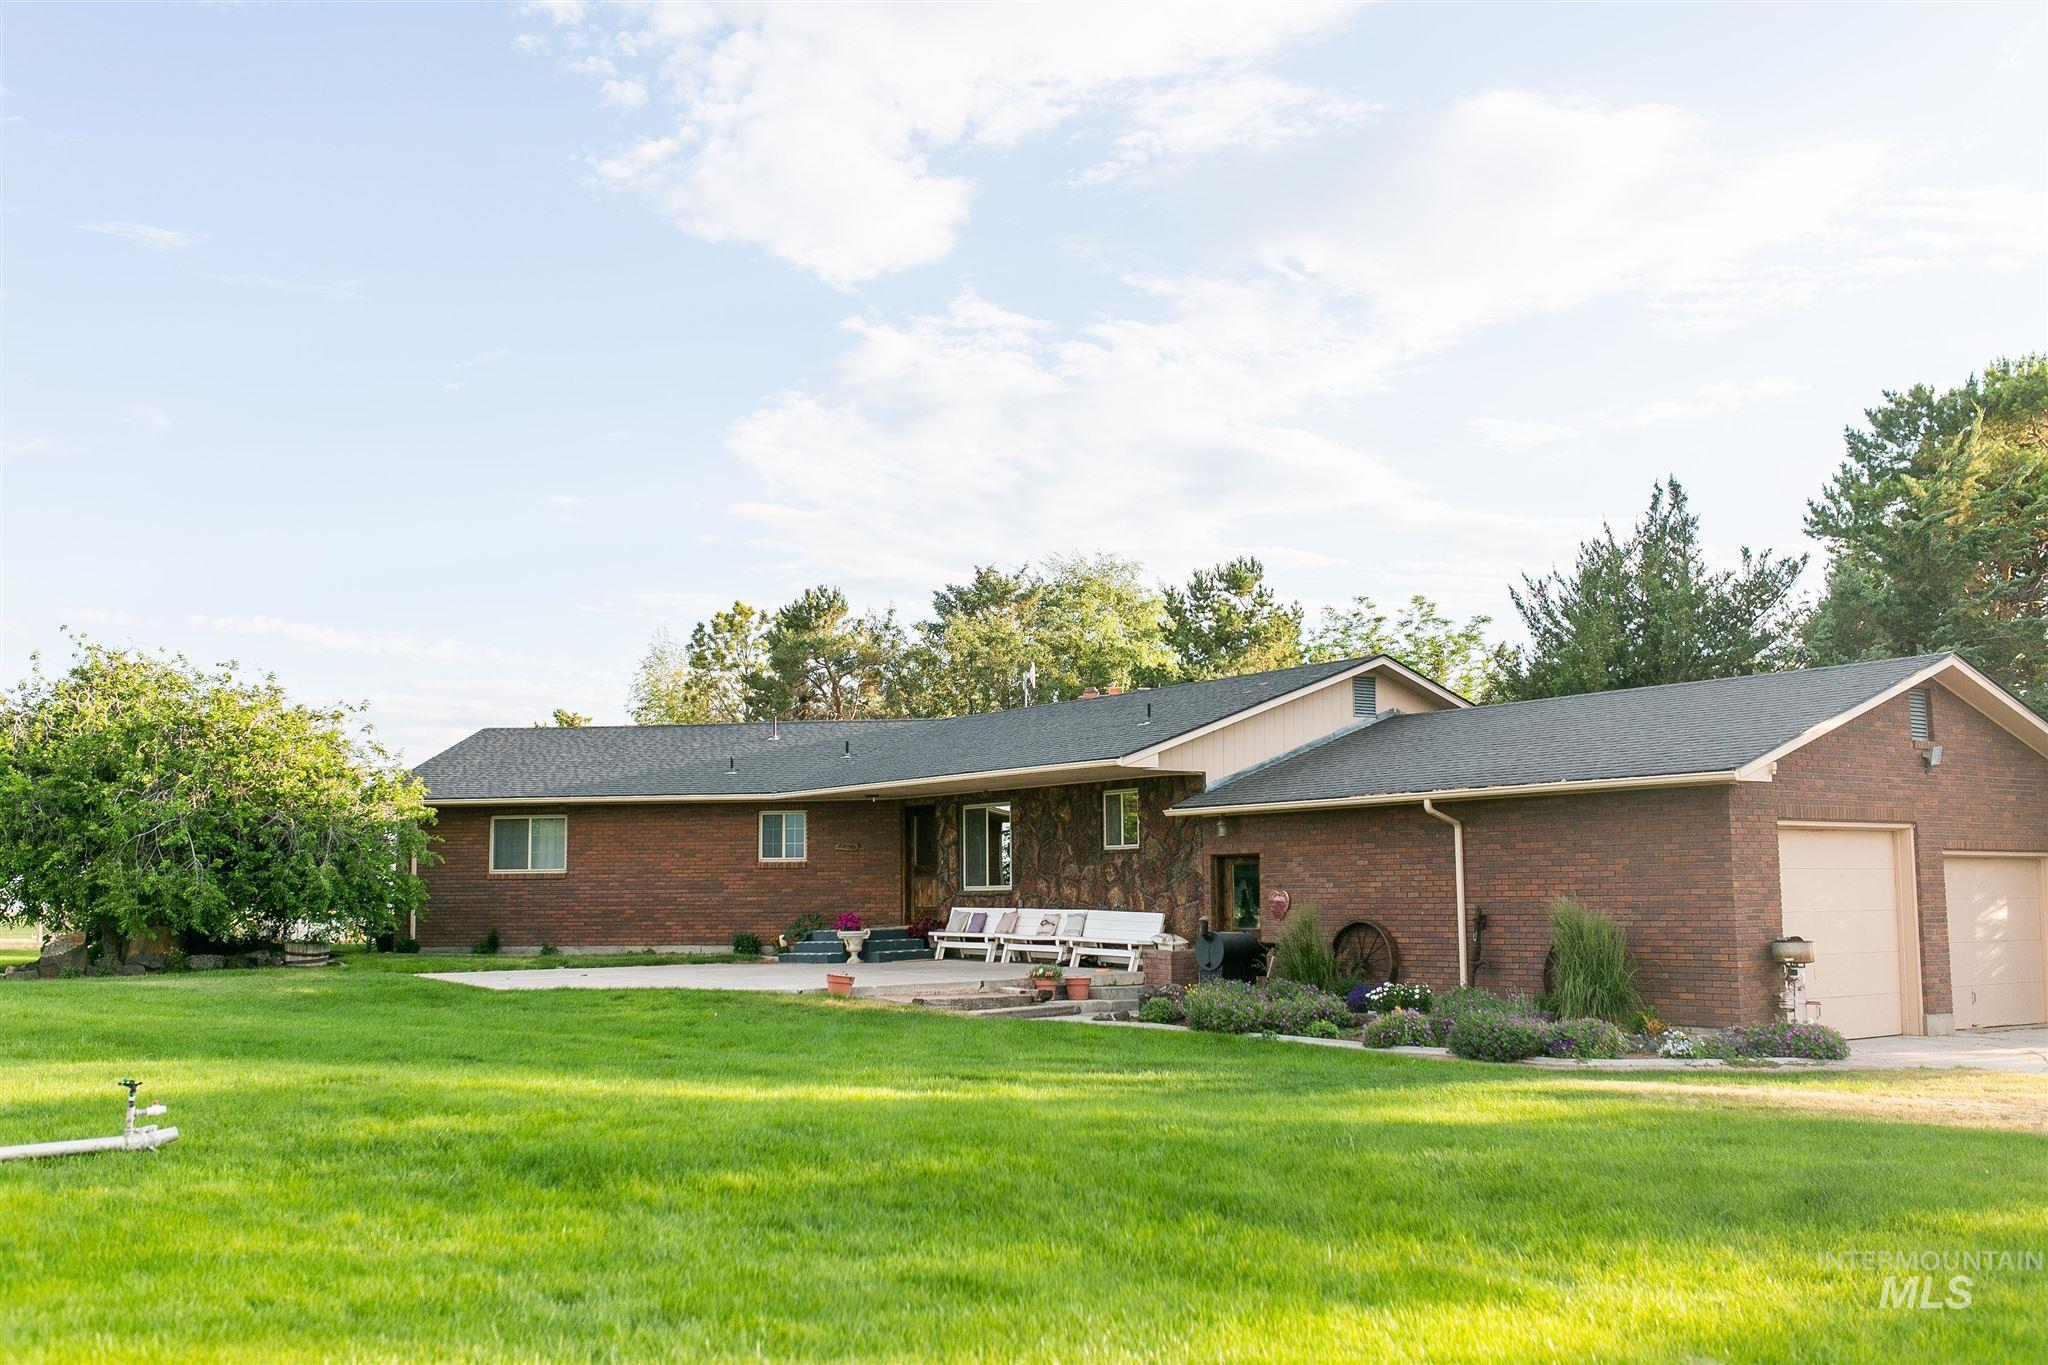 735 N 1050 E Property Photo